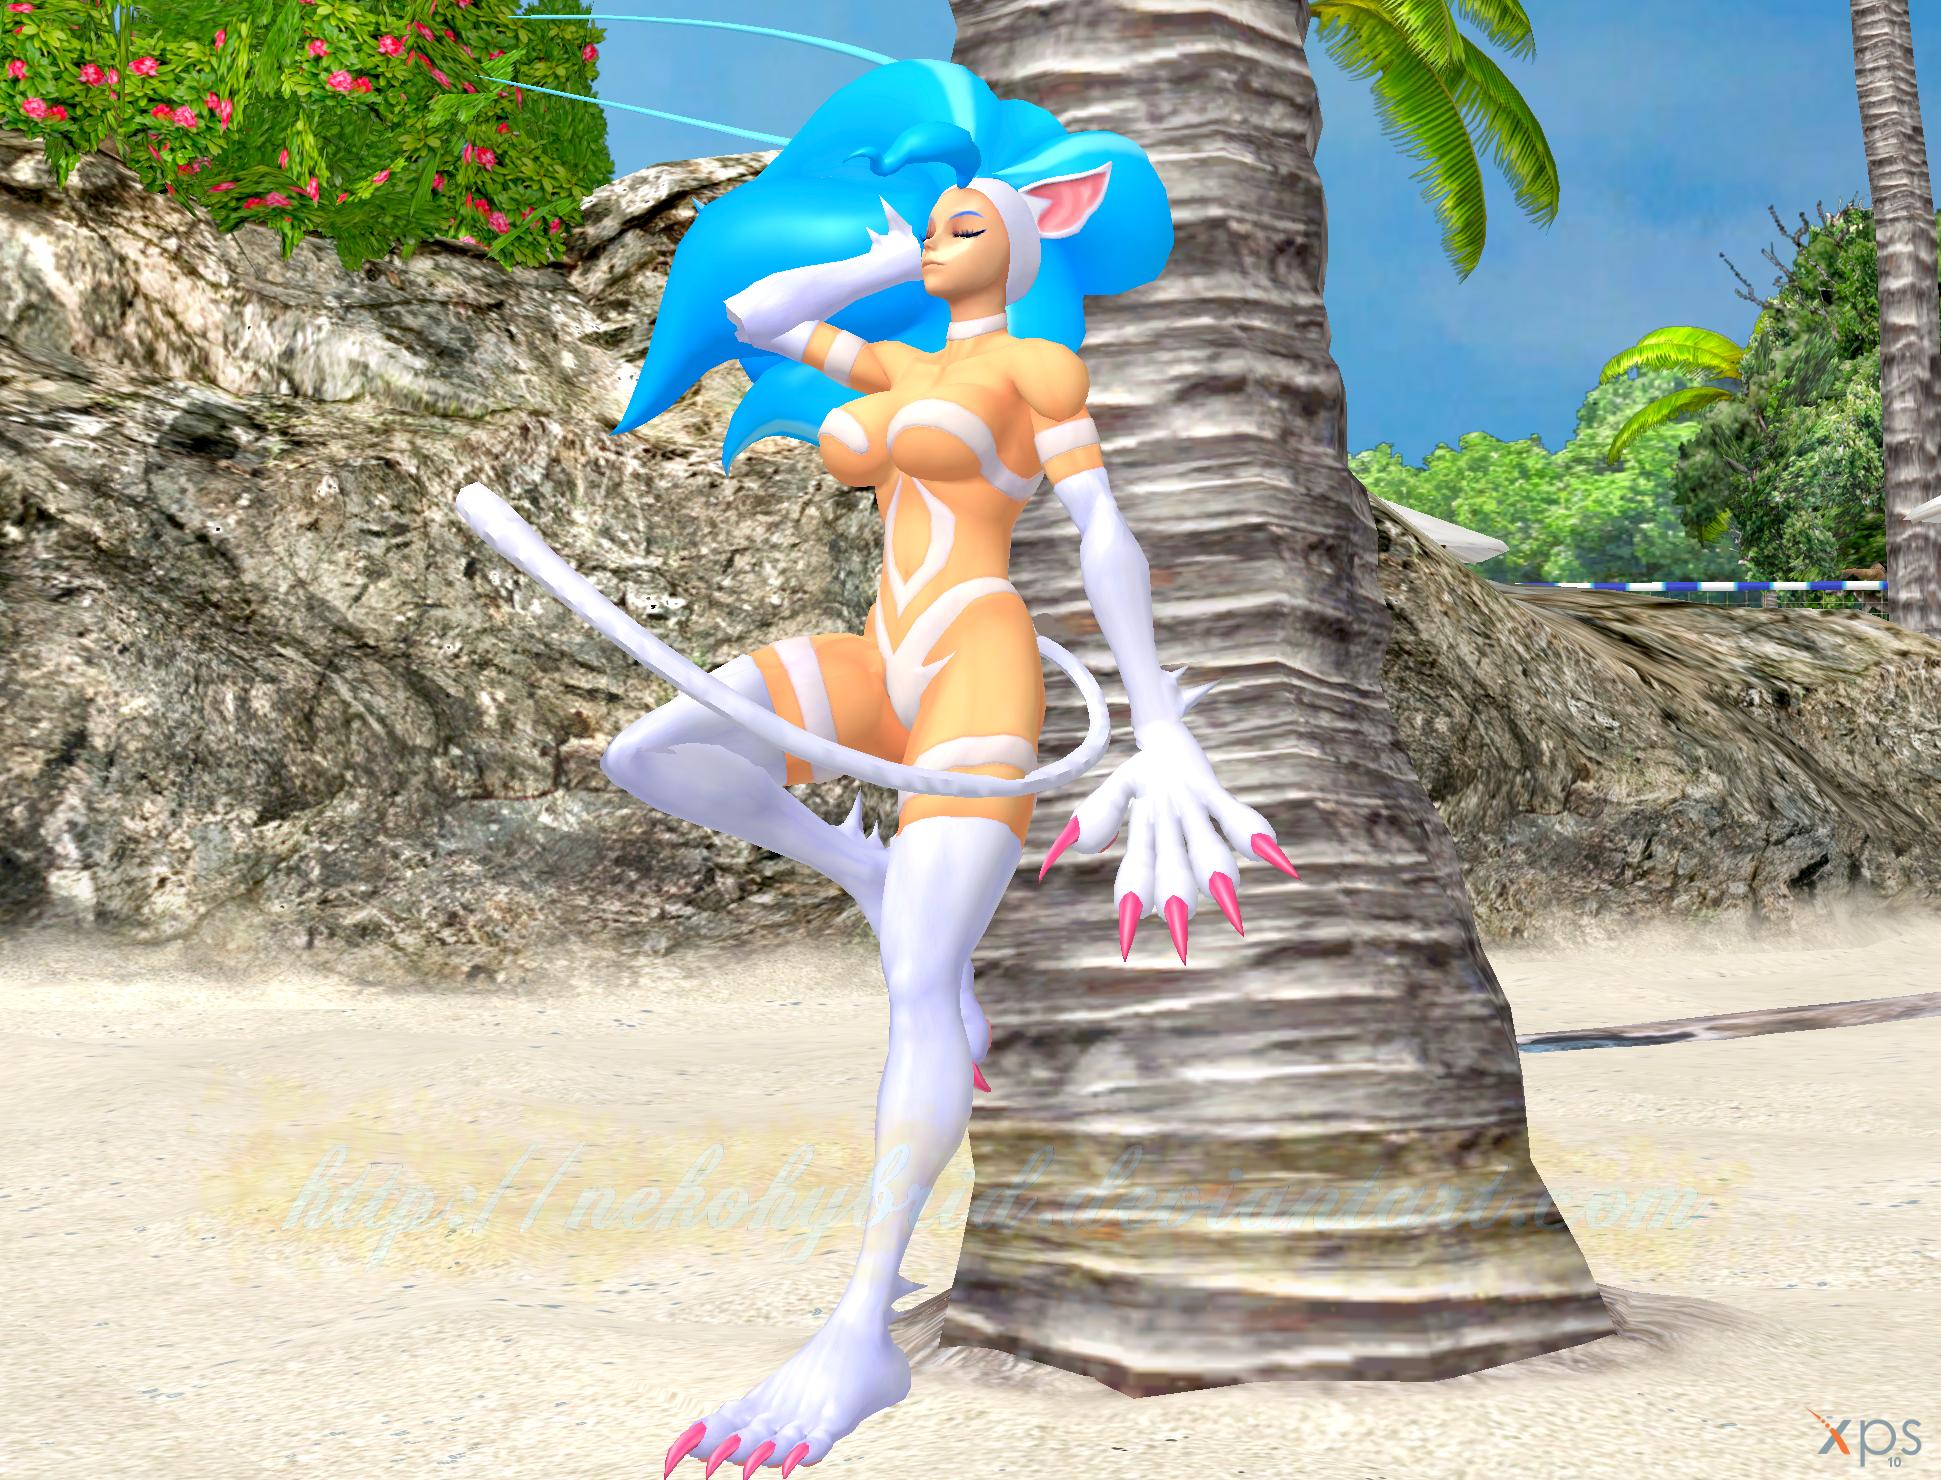 Felicia's Beach Gravure by NekoHybrid